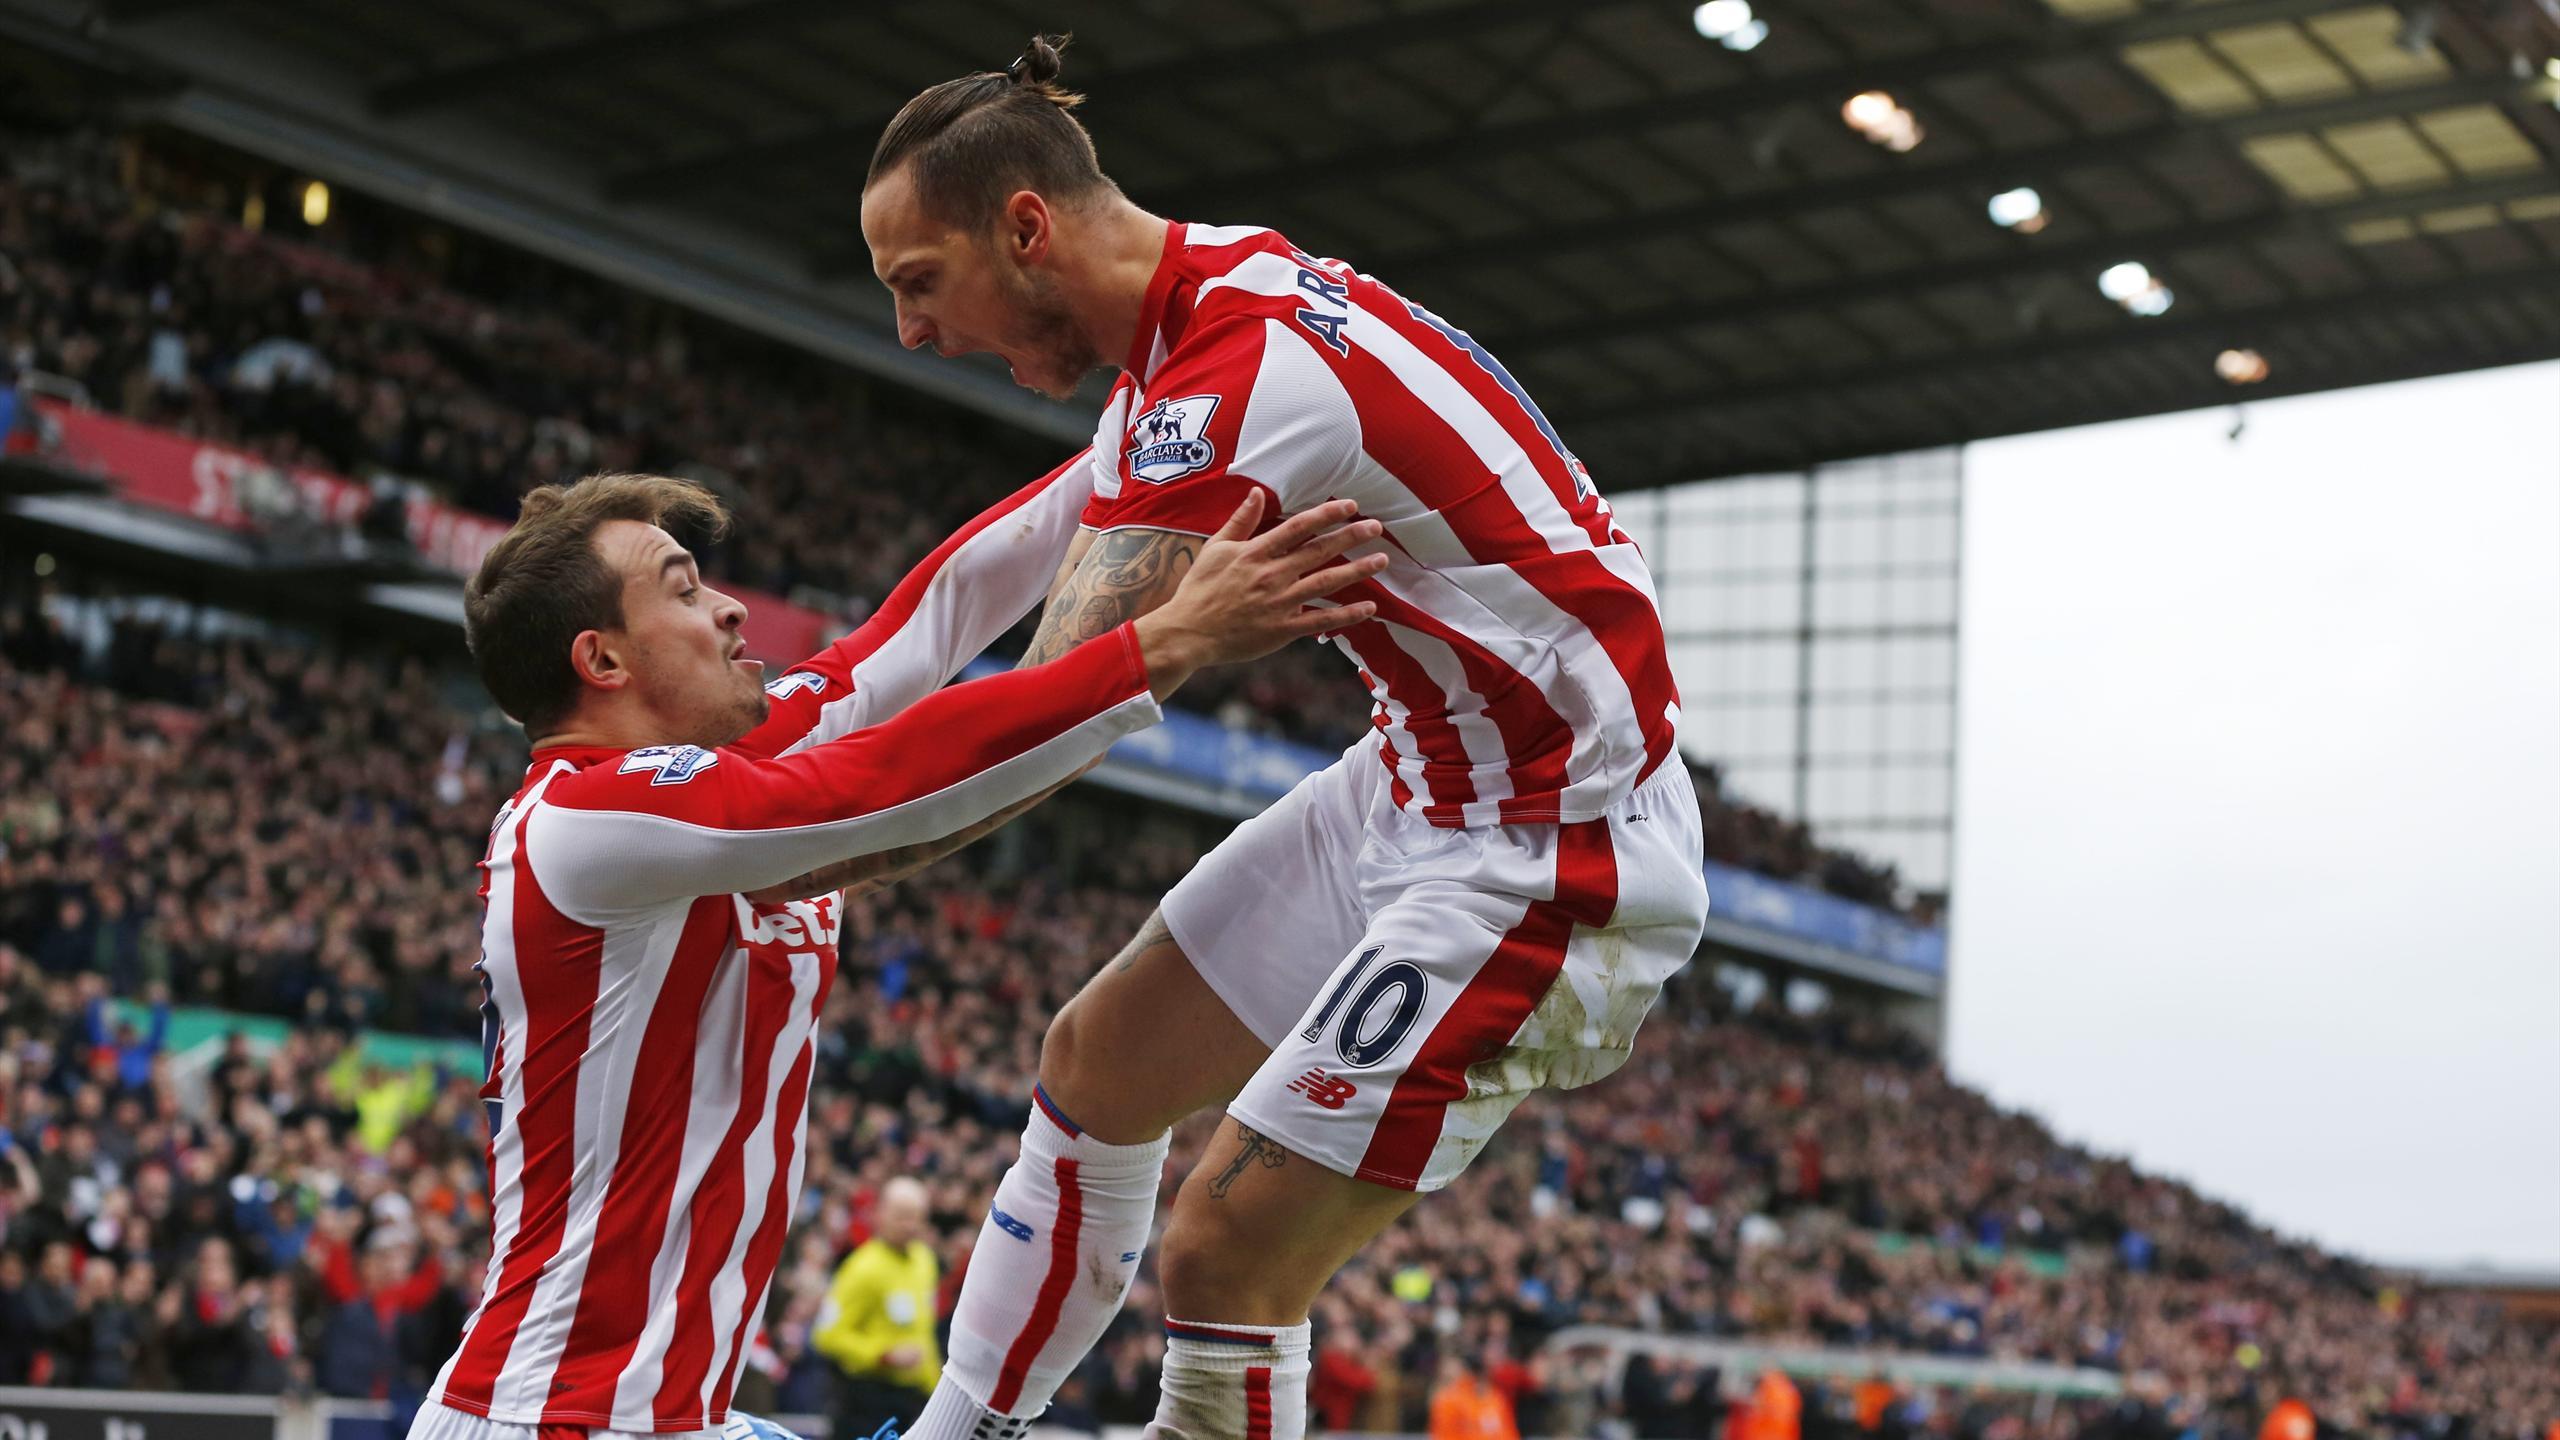 Marko Arnautovic celebrates with Xherdan Shaqiri after scoring the first goal for Stoke City